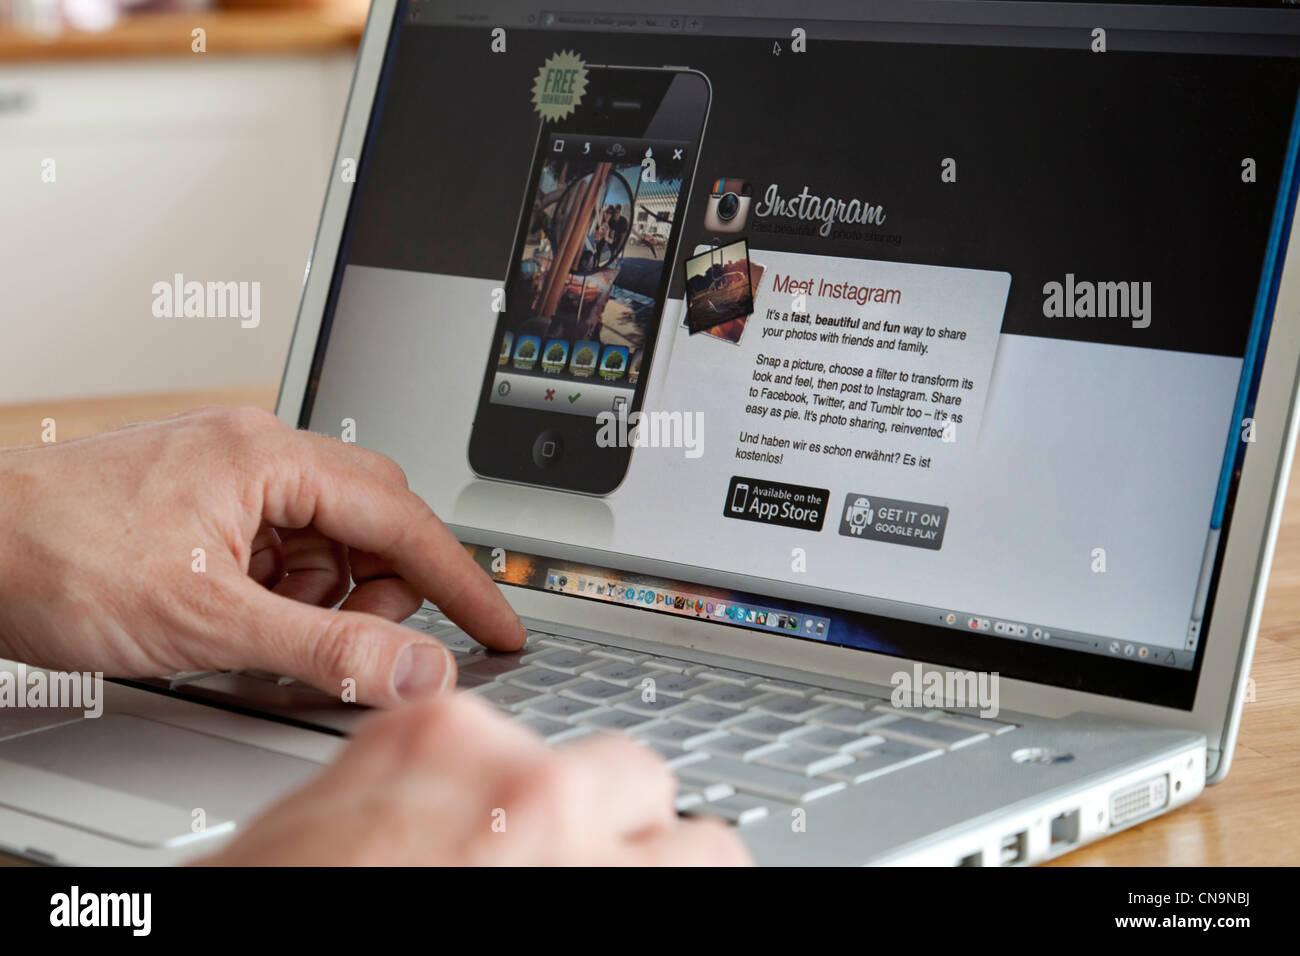 Website of the photo platform Instagram - Stock Image